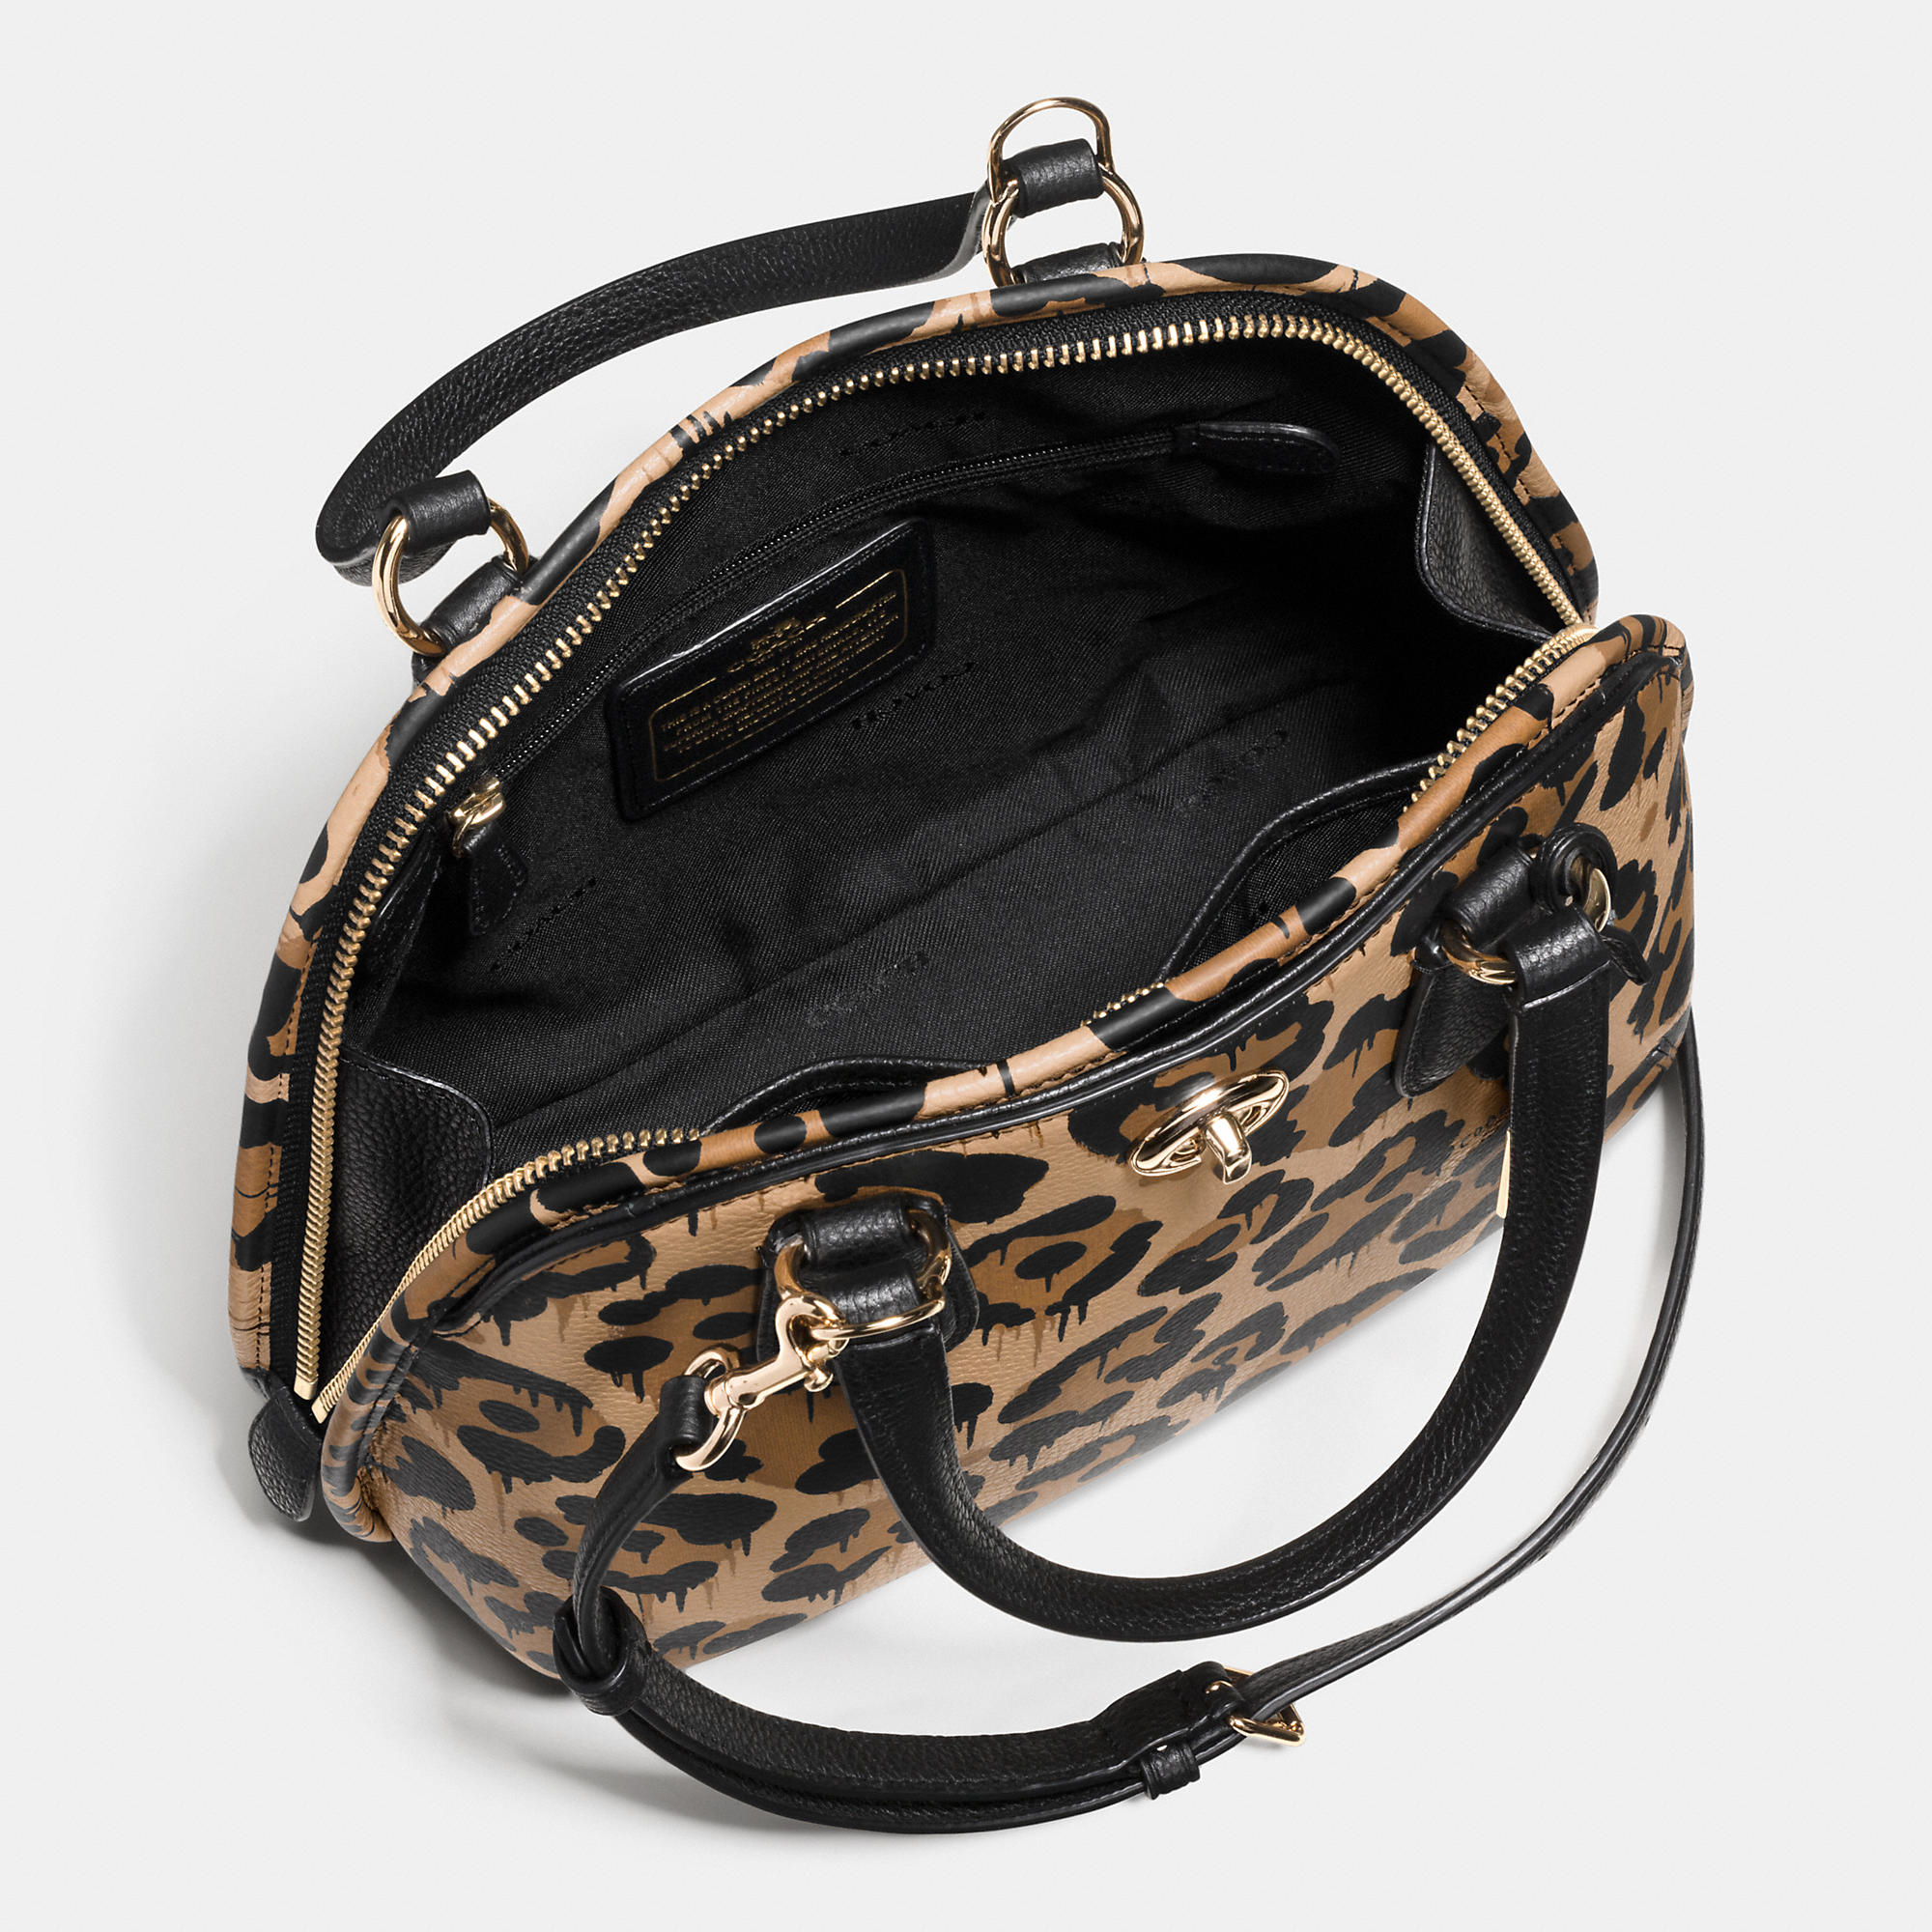 ... low price coach prince street mini satchel in wild beast print leather  42361 13829 sale coach edie handbag ... e11bc541b5e57